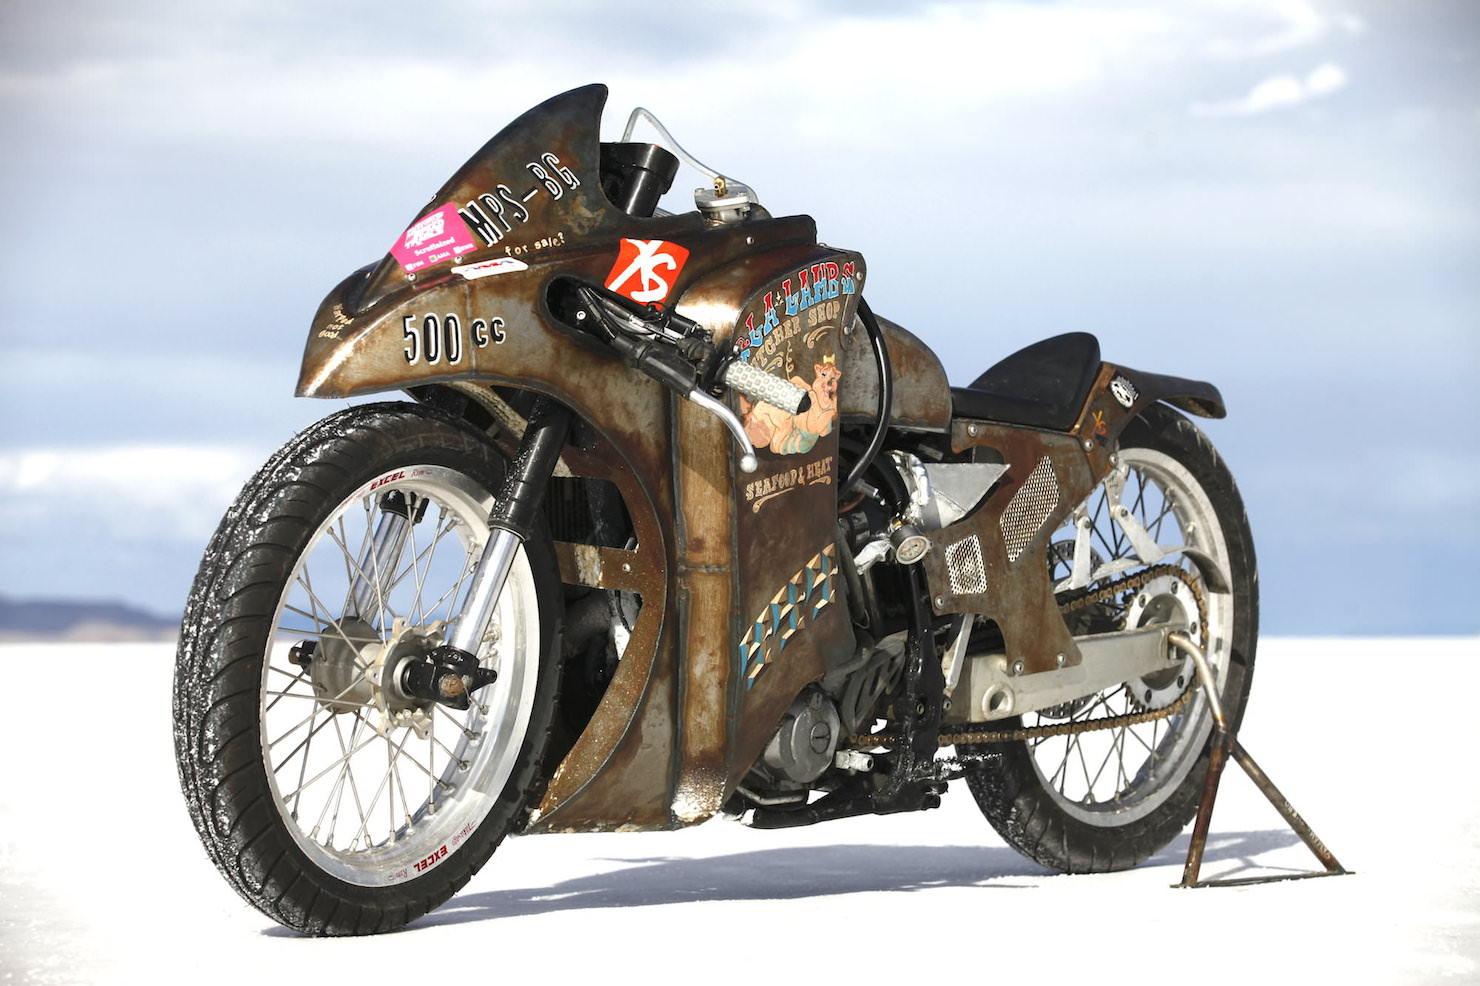 Turbo Yamaha Salt Flat Racer by Super Rat 3